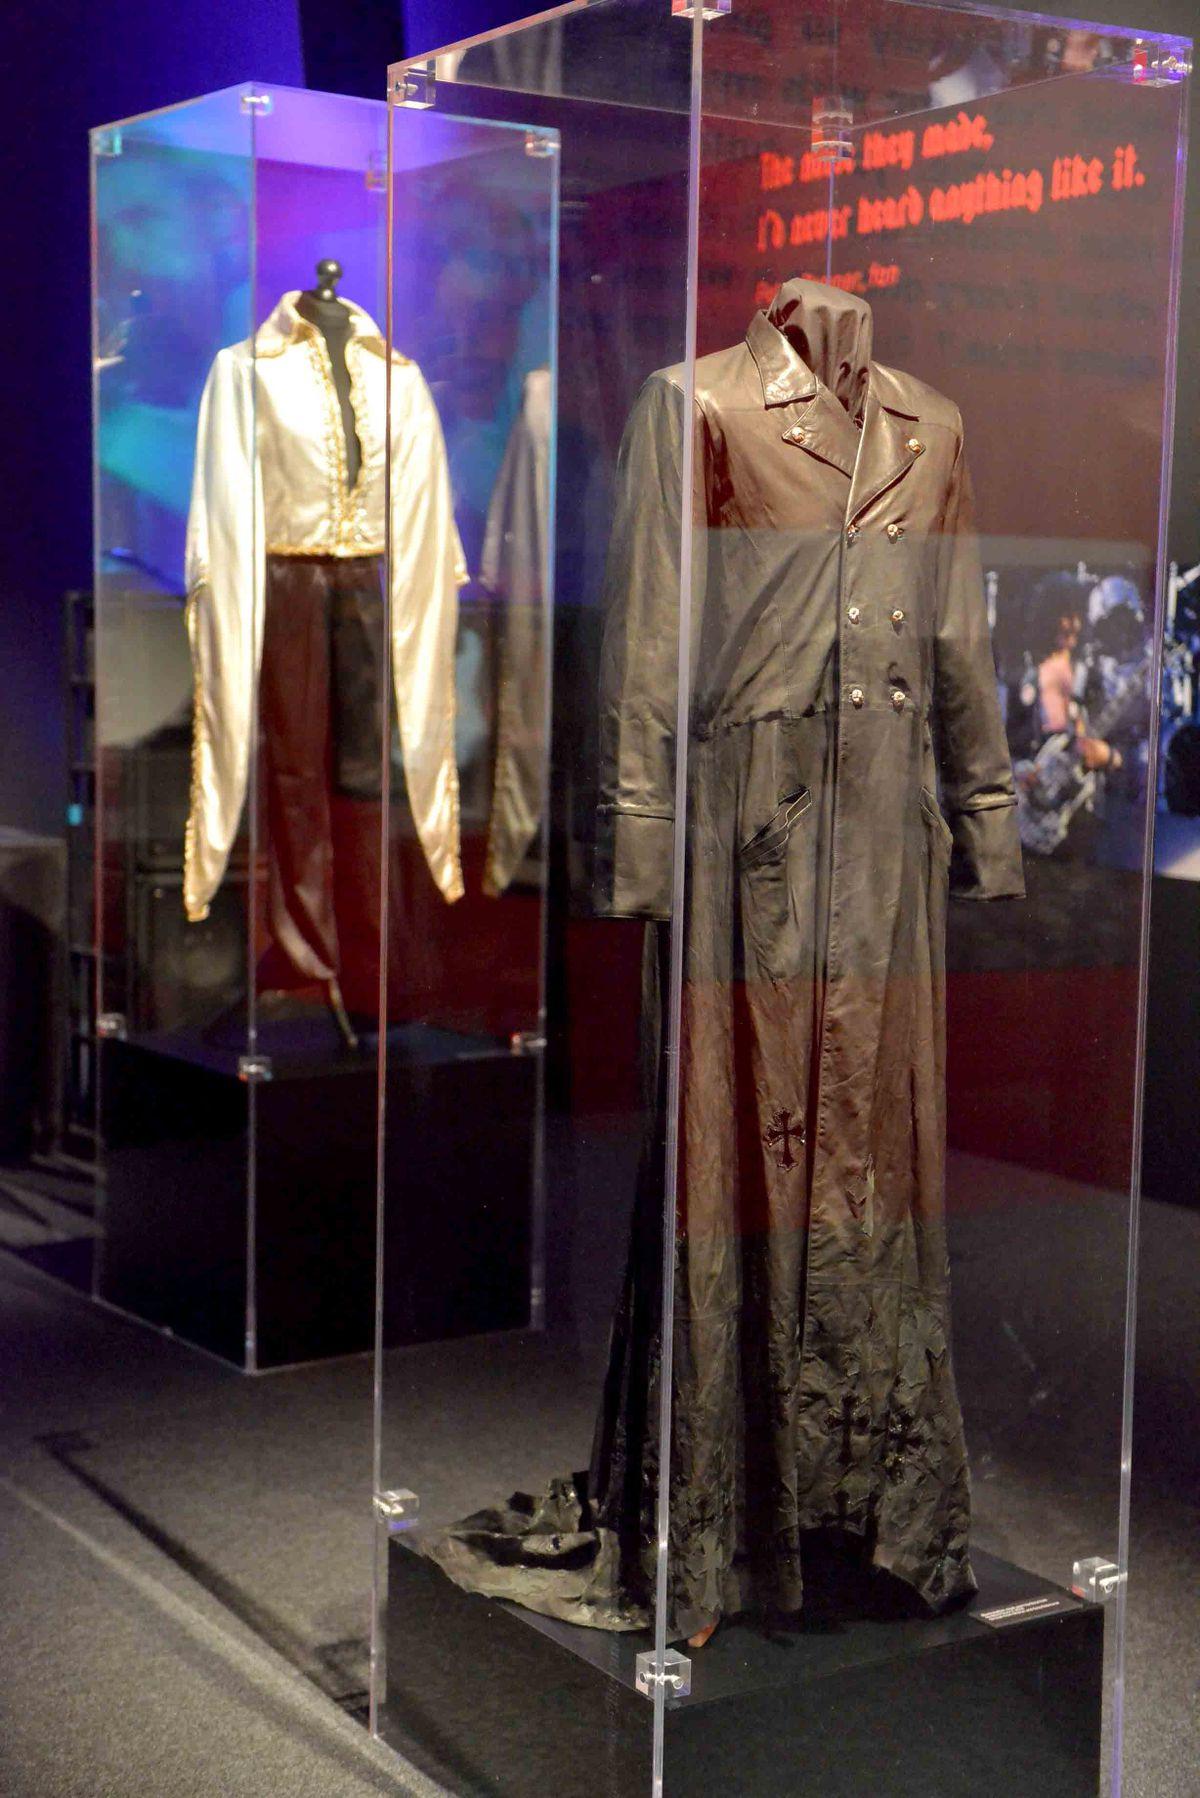 Costumes worn by Ozzy Osbourne